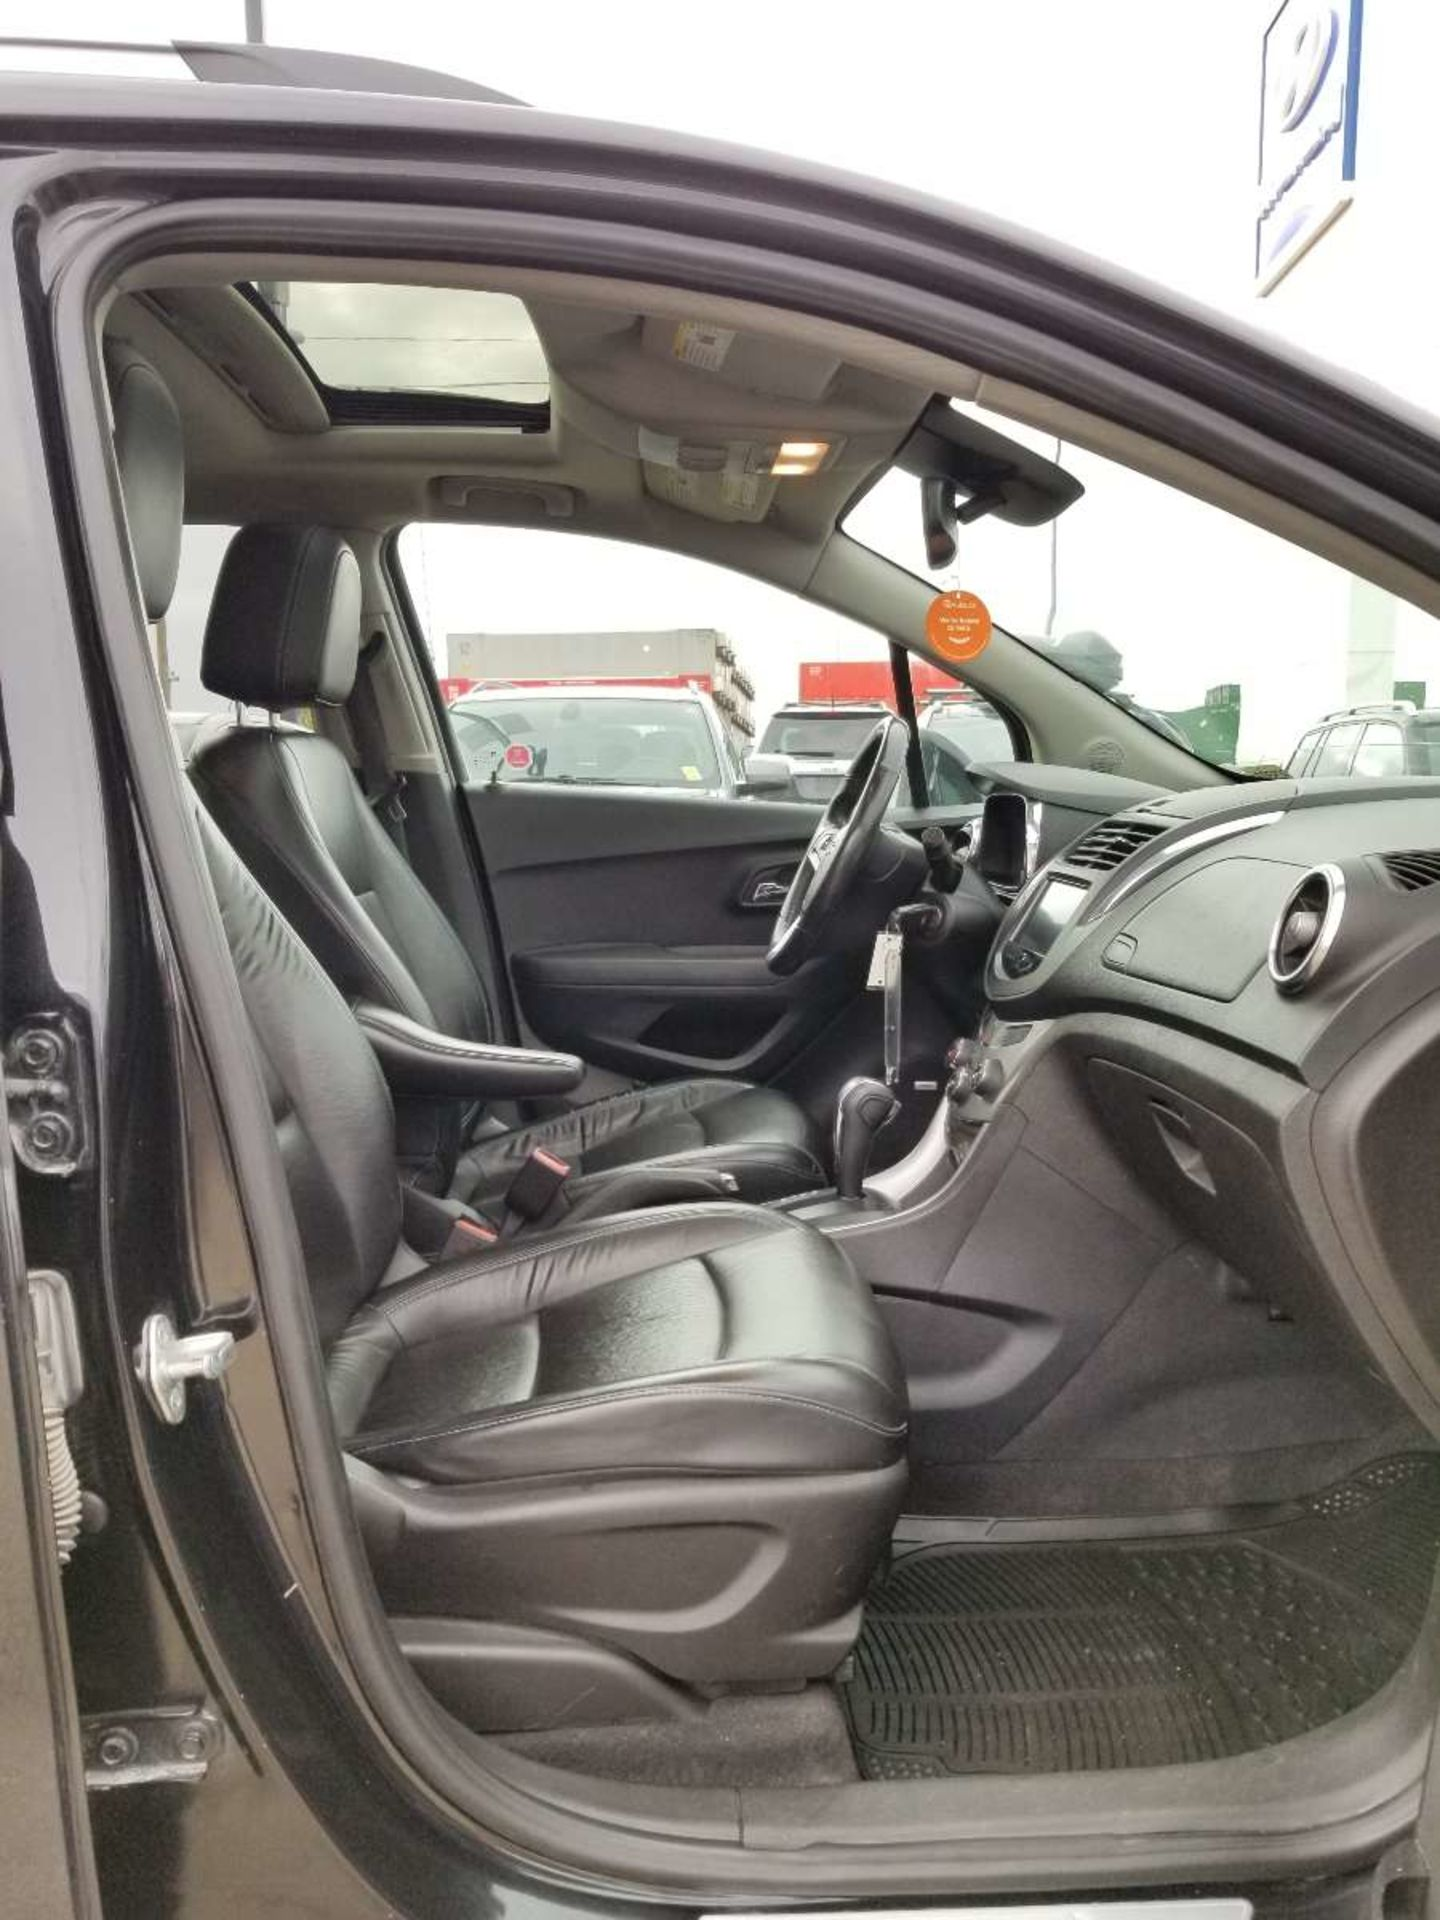 2013 Chevrolet Trax LTZ for sale in Edmonton, Alberta